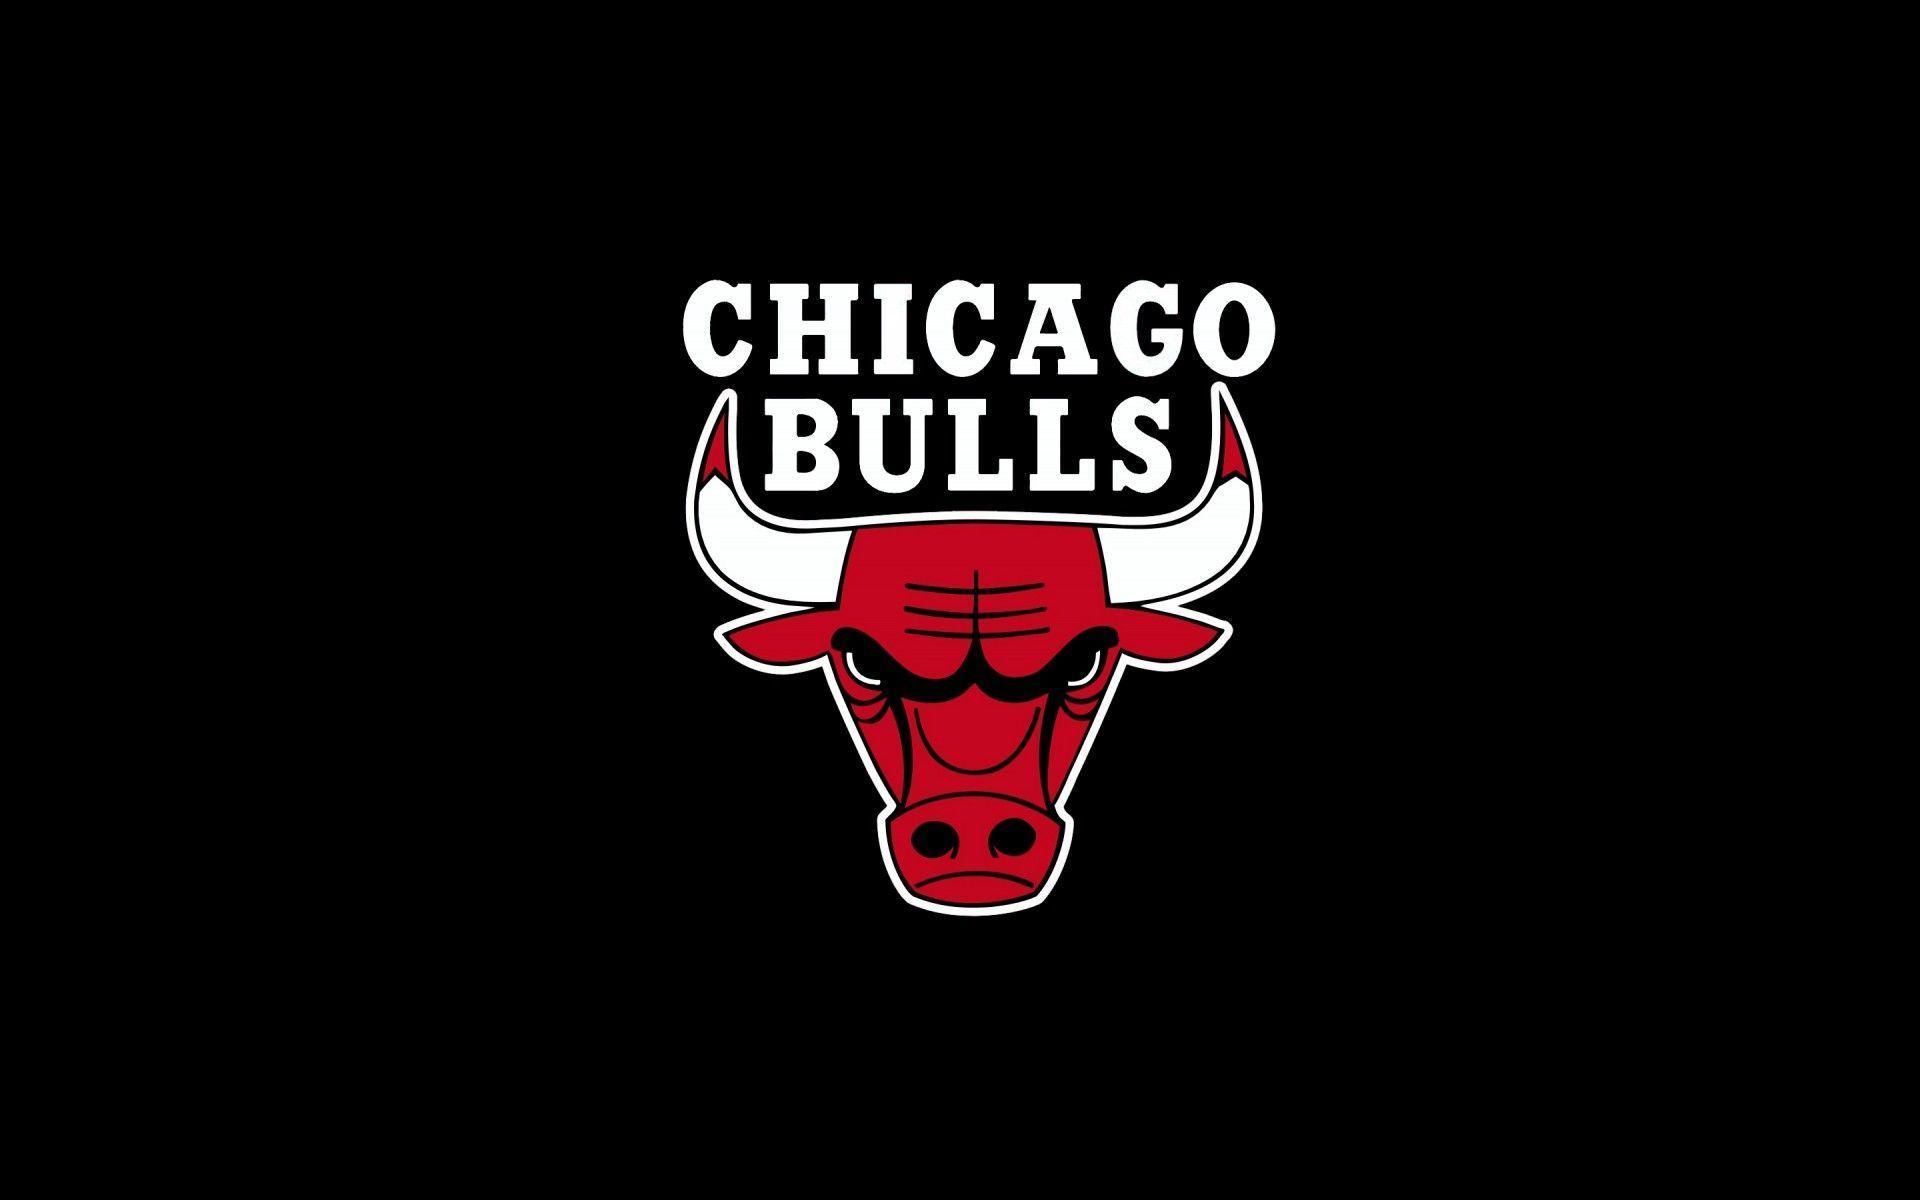 Chicago Bulls Wallpapers HD 1920x1200